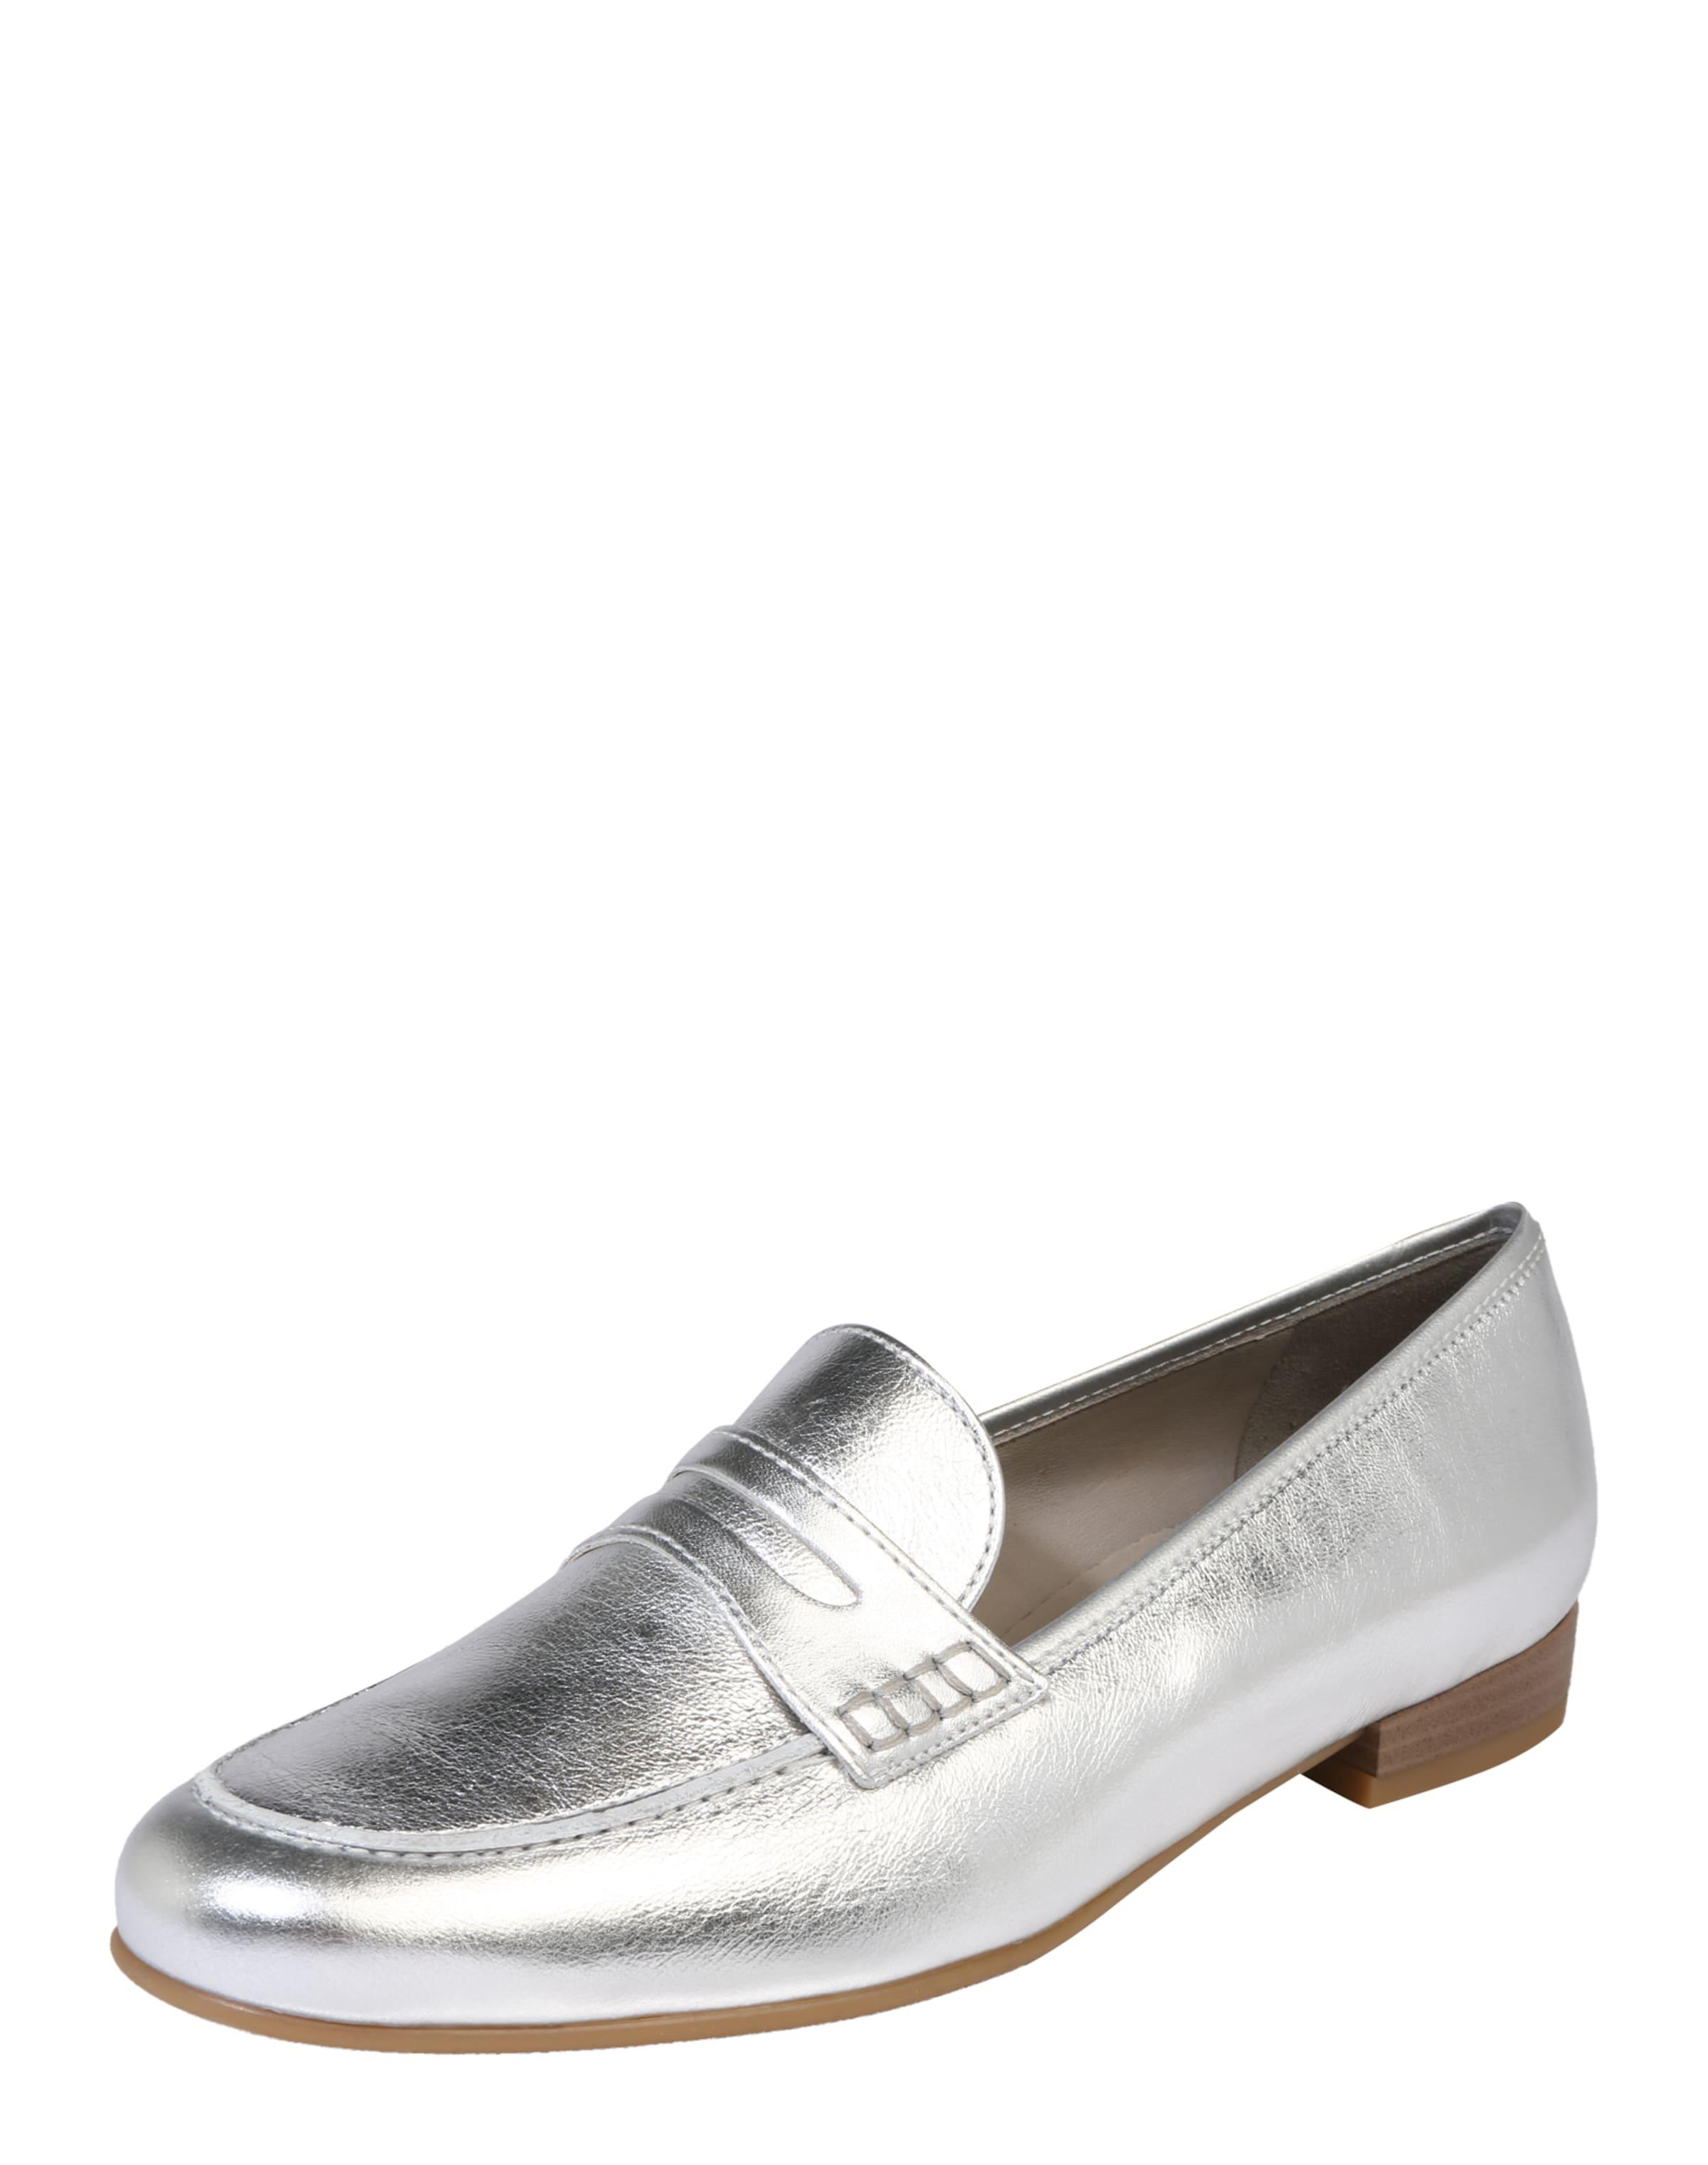 Haltbare Mode billige Schuhe ARA | femininer Slipper 'Kent' Schuhe Gut getragene Schuhe